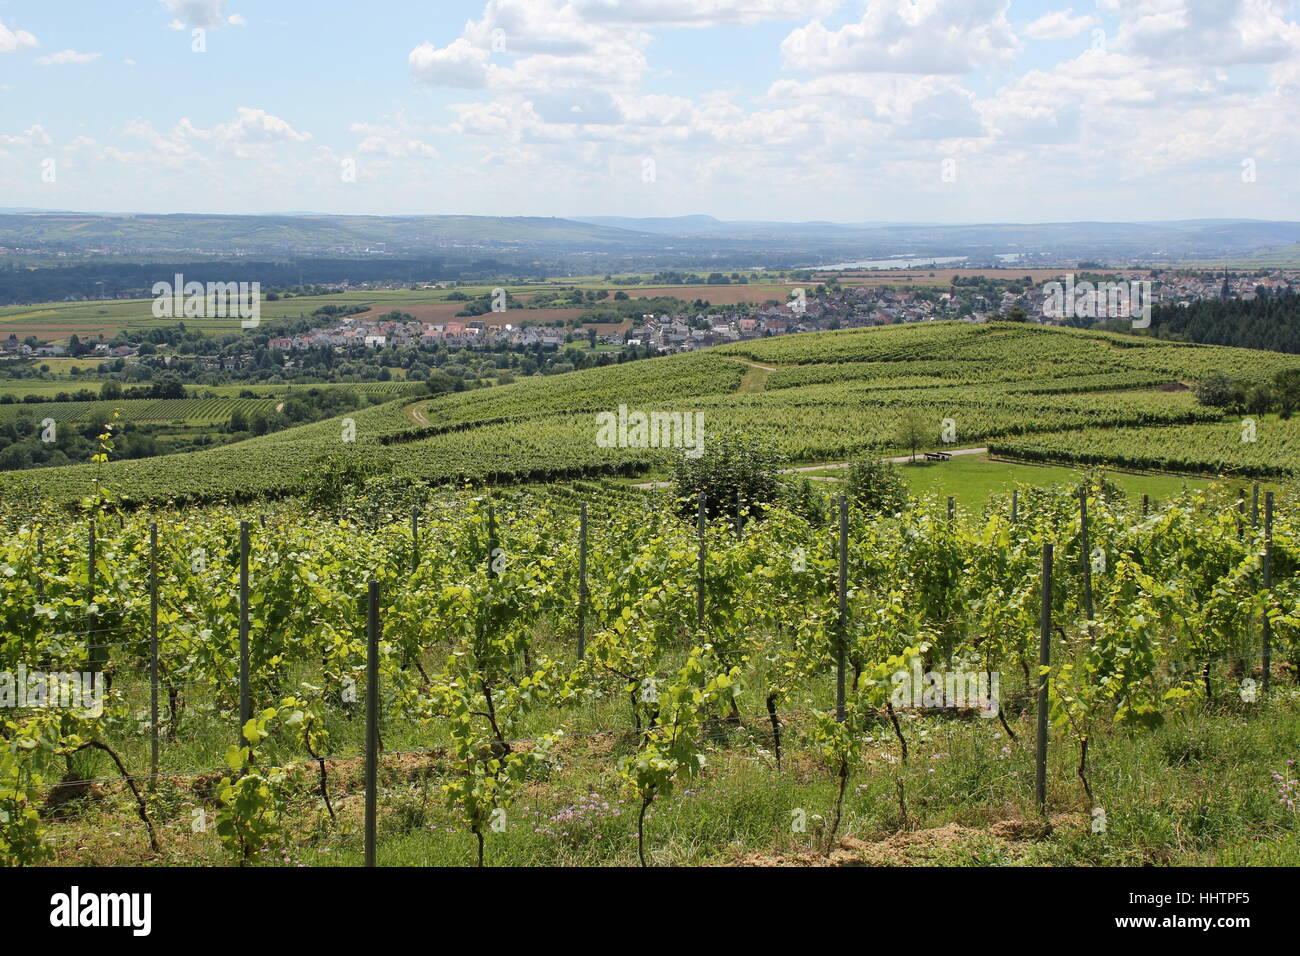 vineyards, blank, european, caucasian, europe, cultivation of wine, location - Stock Image